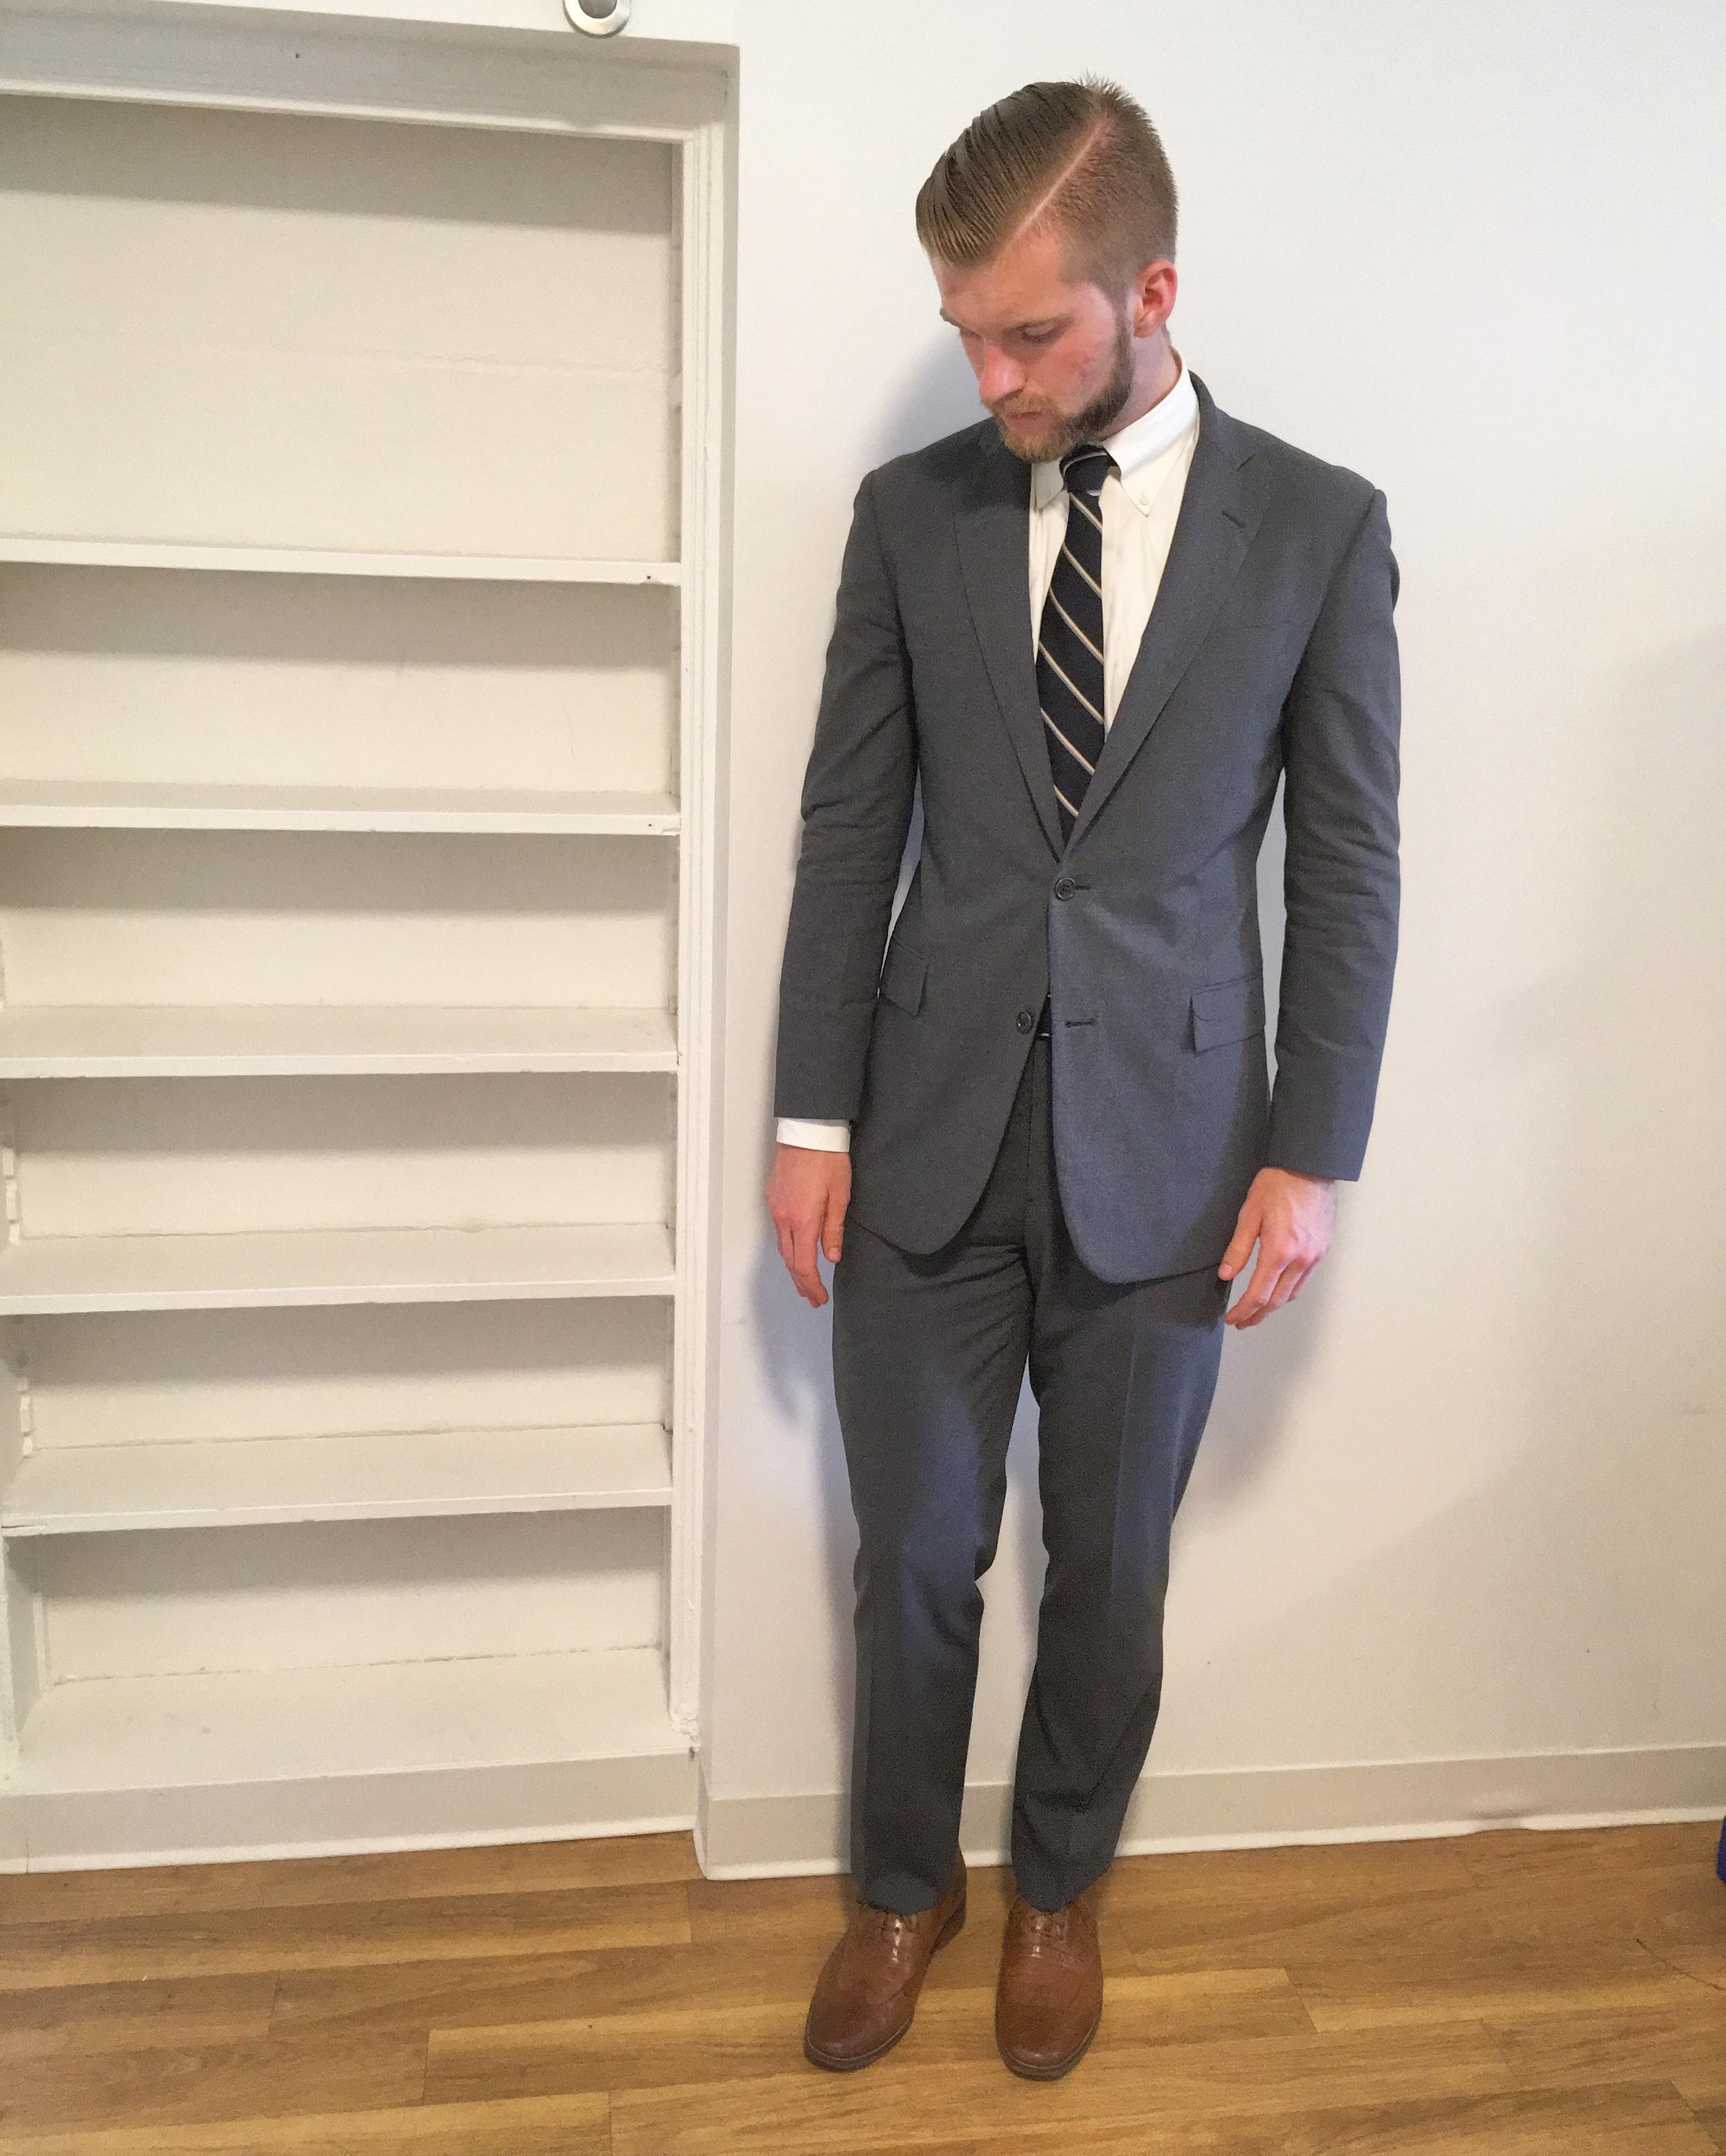 Brooks Brothers suit/Charles Tyrwhitt/Cole Haan/Tiebar